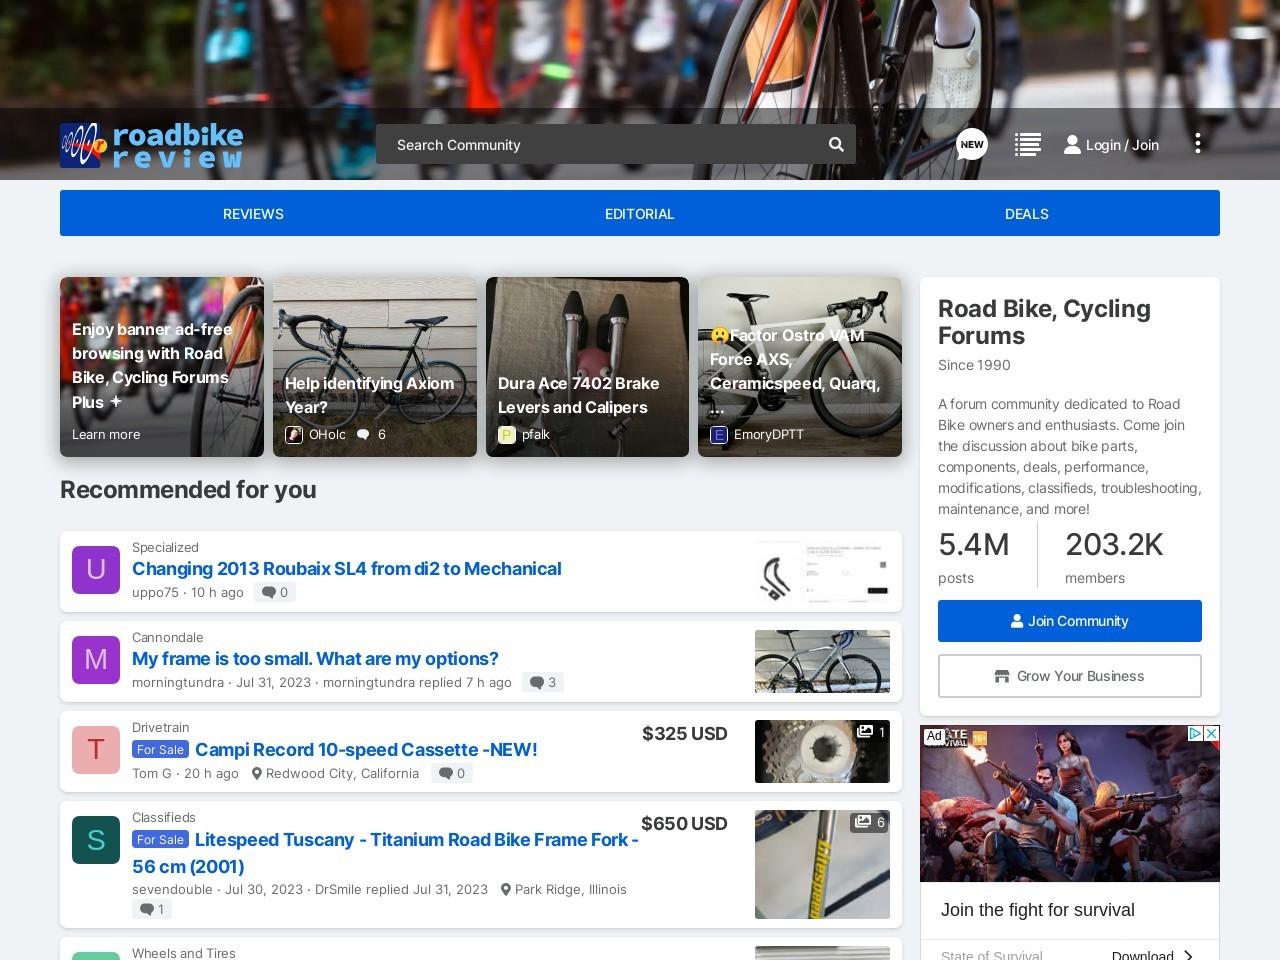 roadbikereview.com